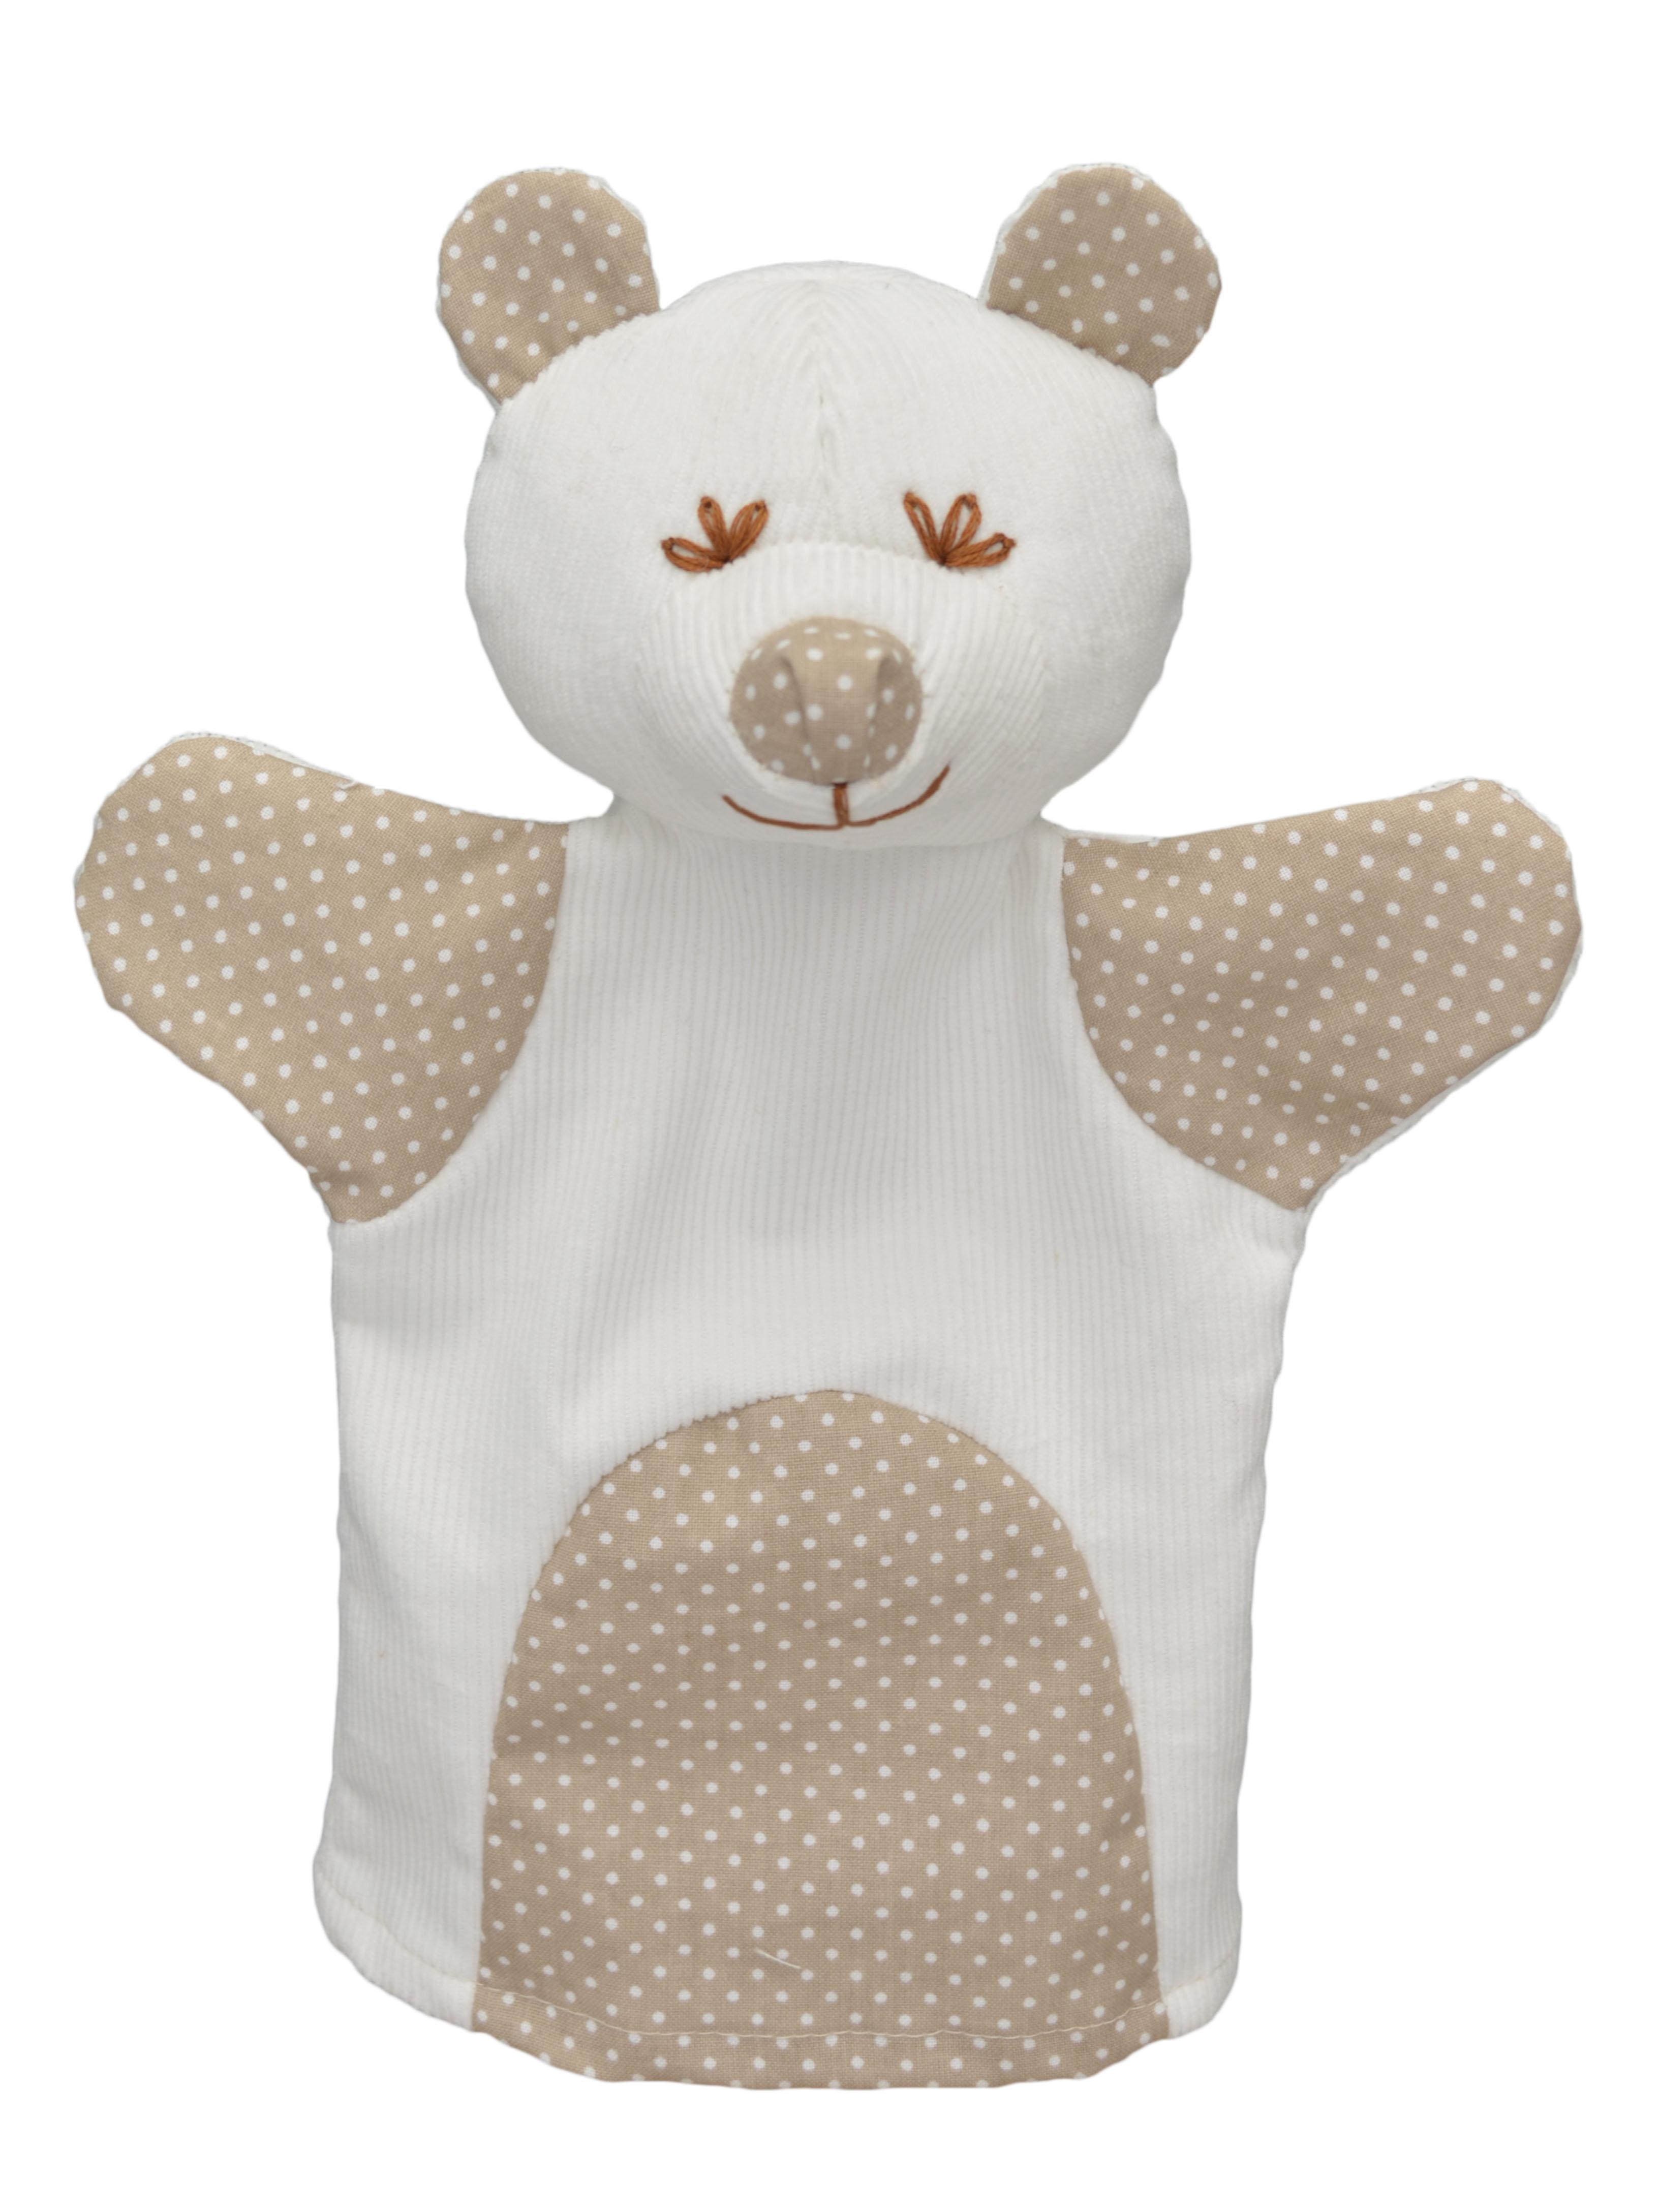 Maňásek na ruku - Medvěd MIMI, puntík